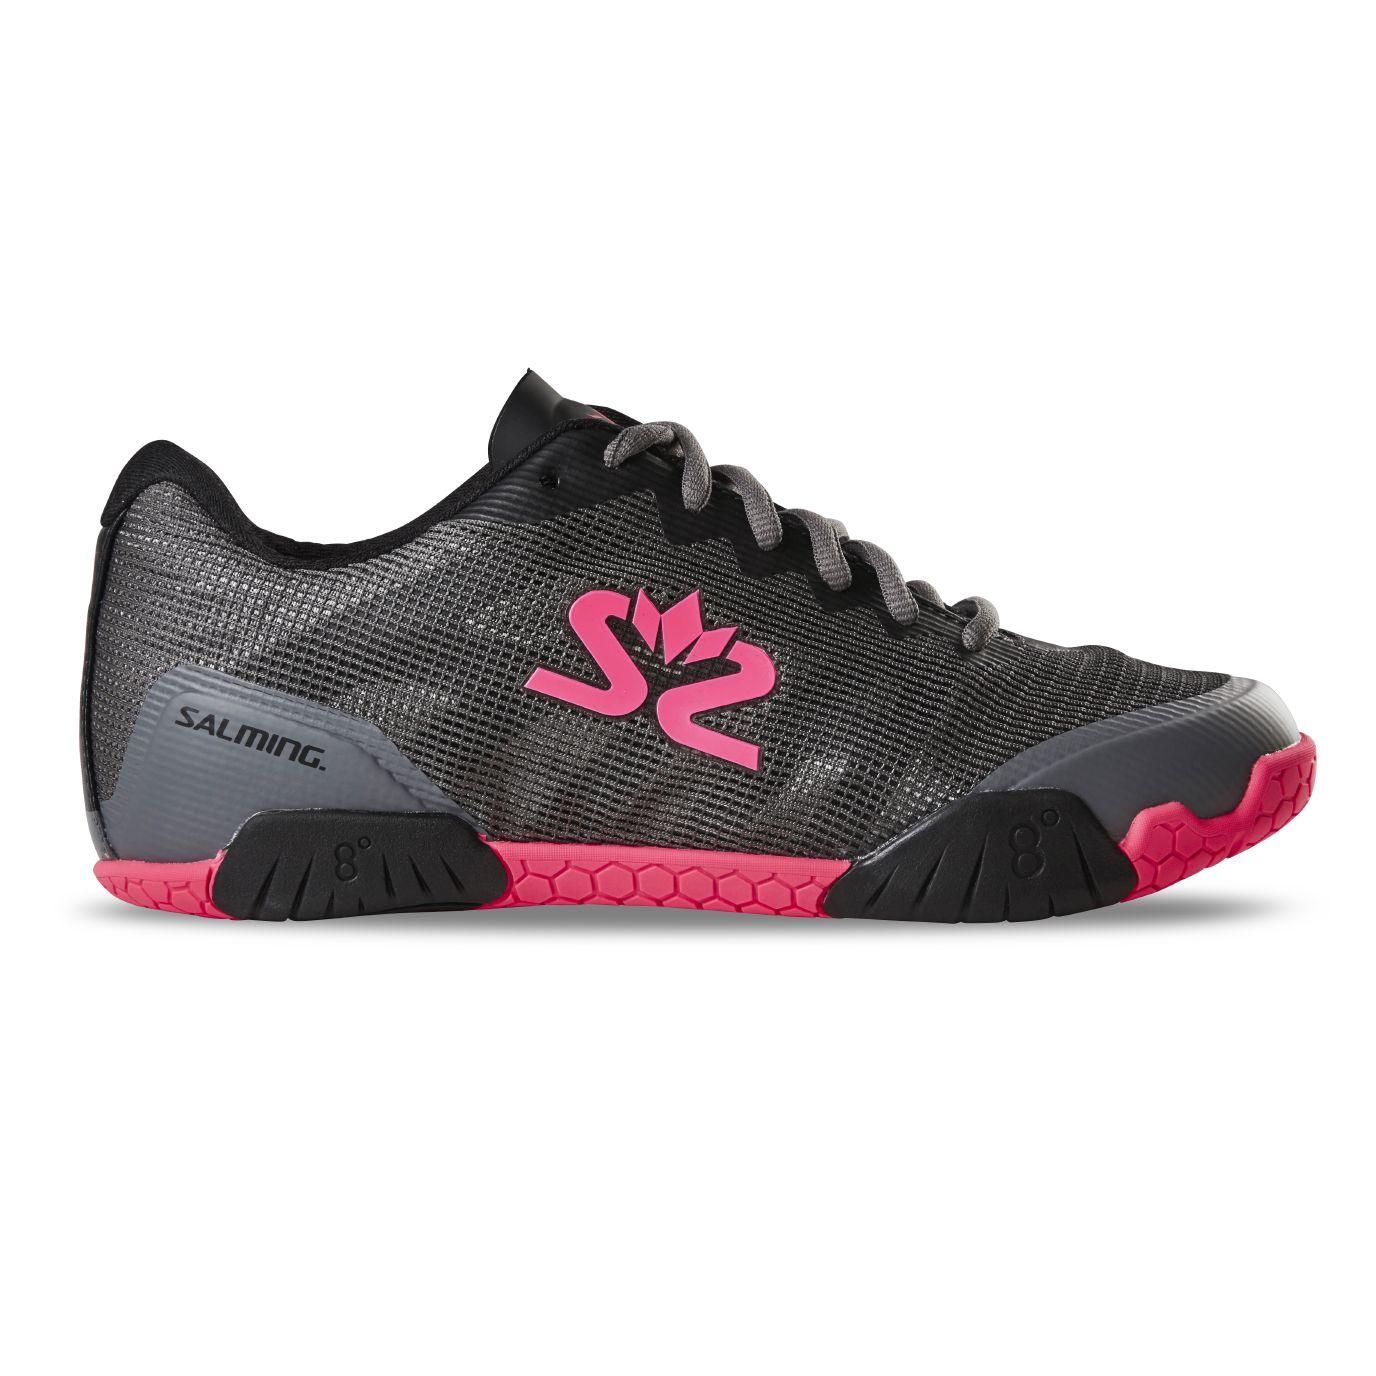 Salming Hawk Shoe Women GunMetal/Pink 6 UK - 39 1/3 EUR - 25 cm